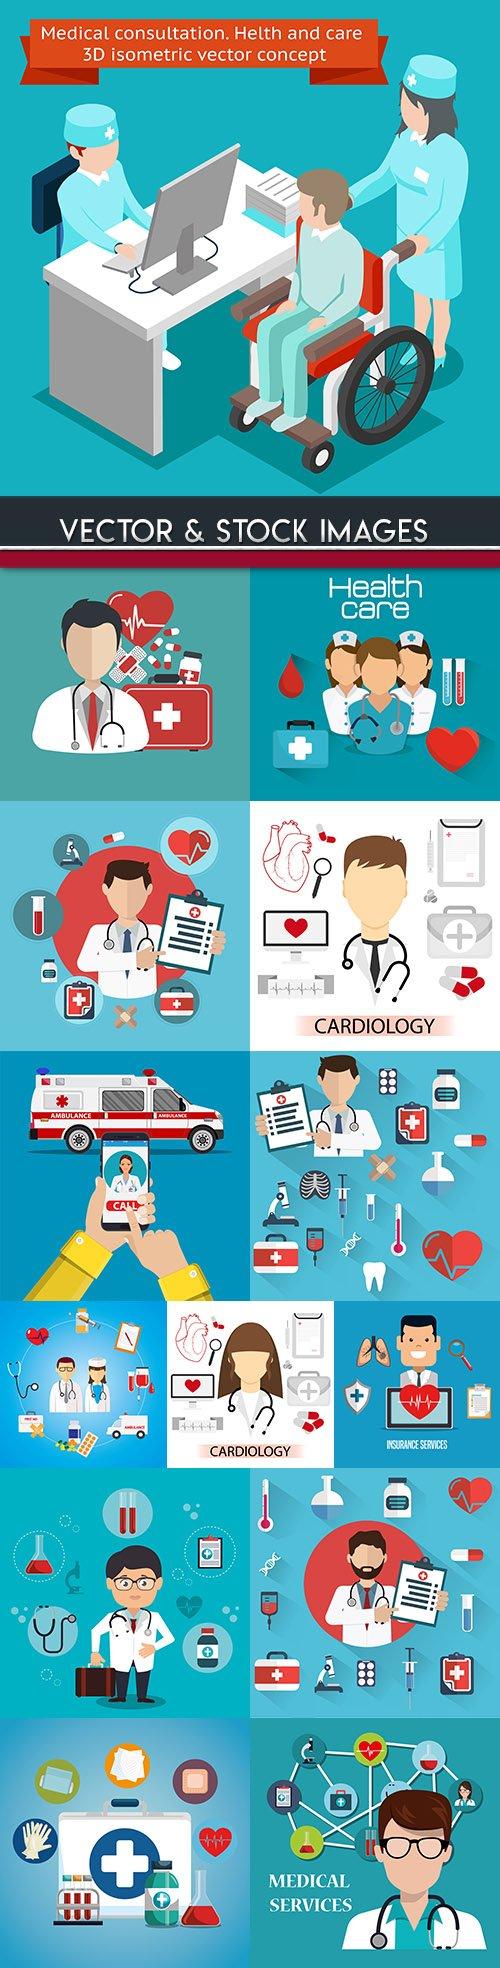 Medicine professional dignostic and equipment illustration 13